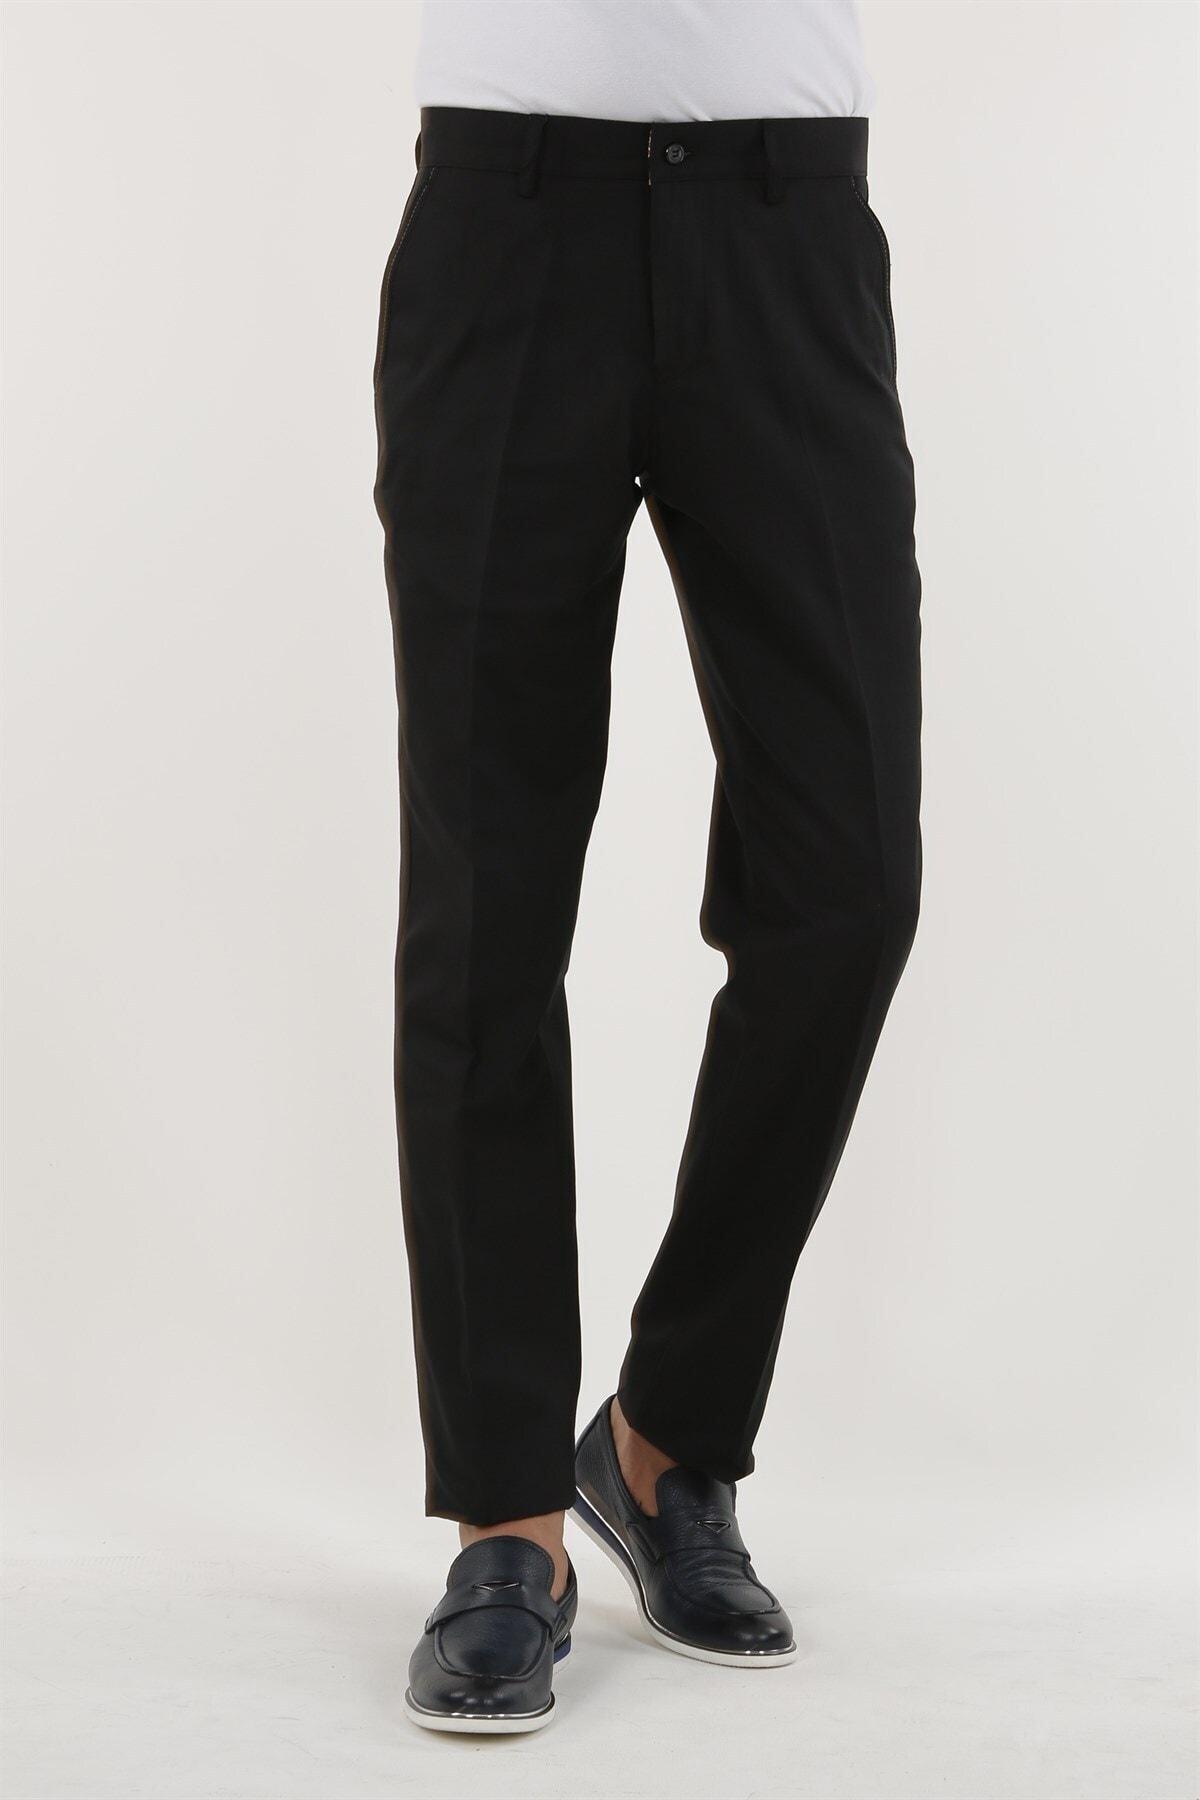 Jakamen Siyah Renk Klasik Kalıp Erkek Pantolon 1